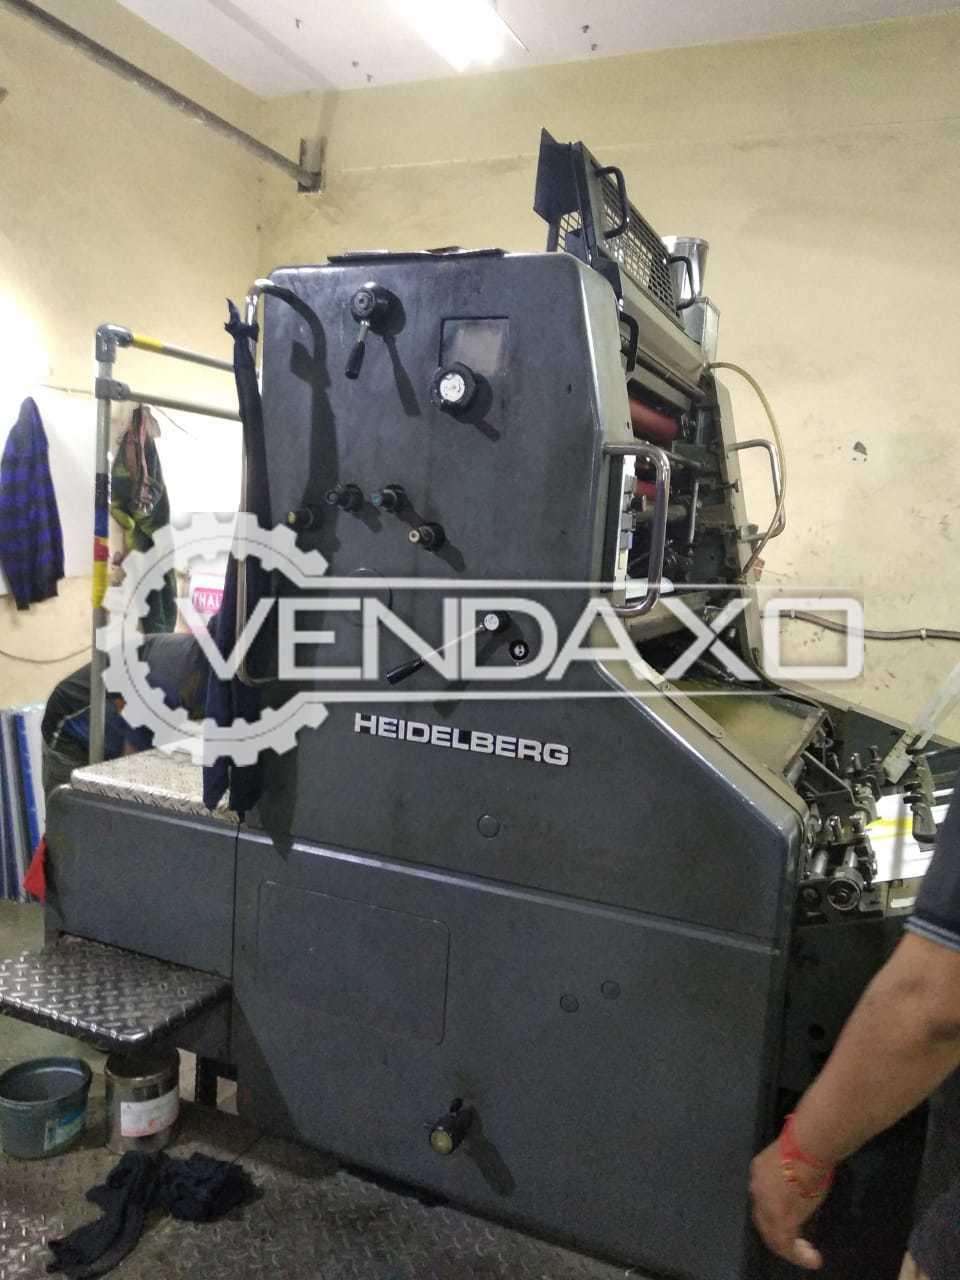 Heidelberg SORM Single Color Offset Printing Machine - Size - 20 x 29 Inch